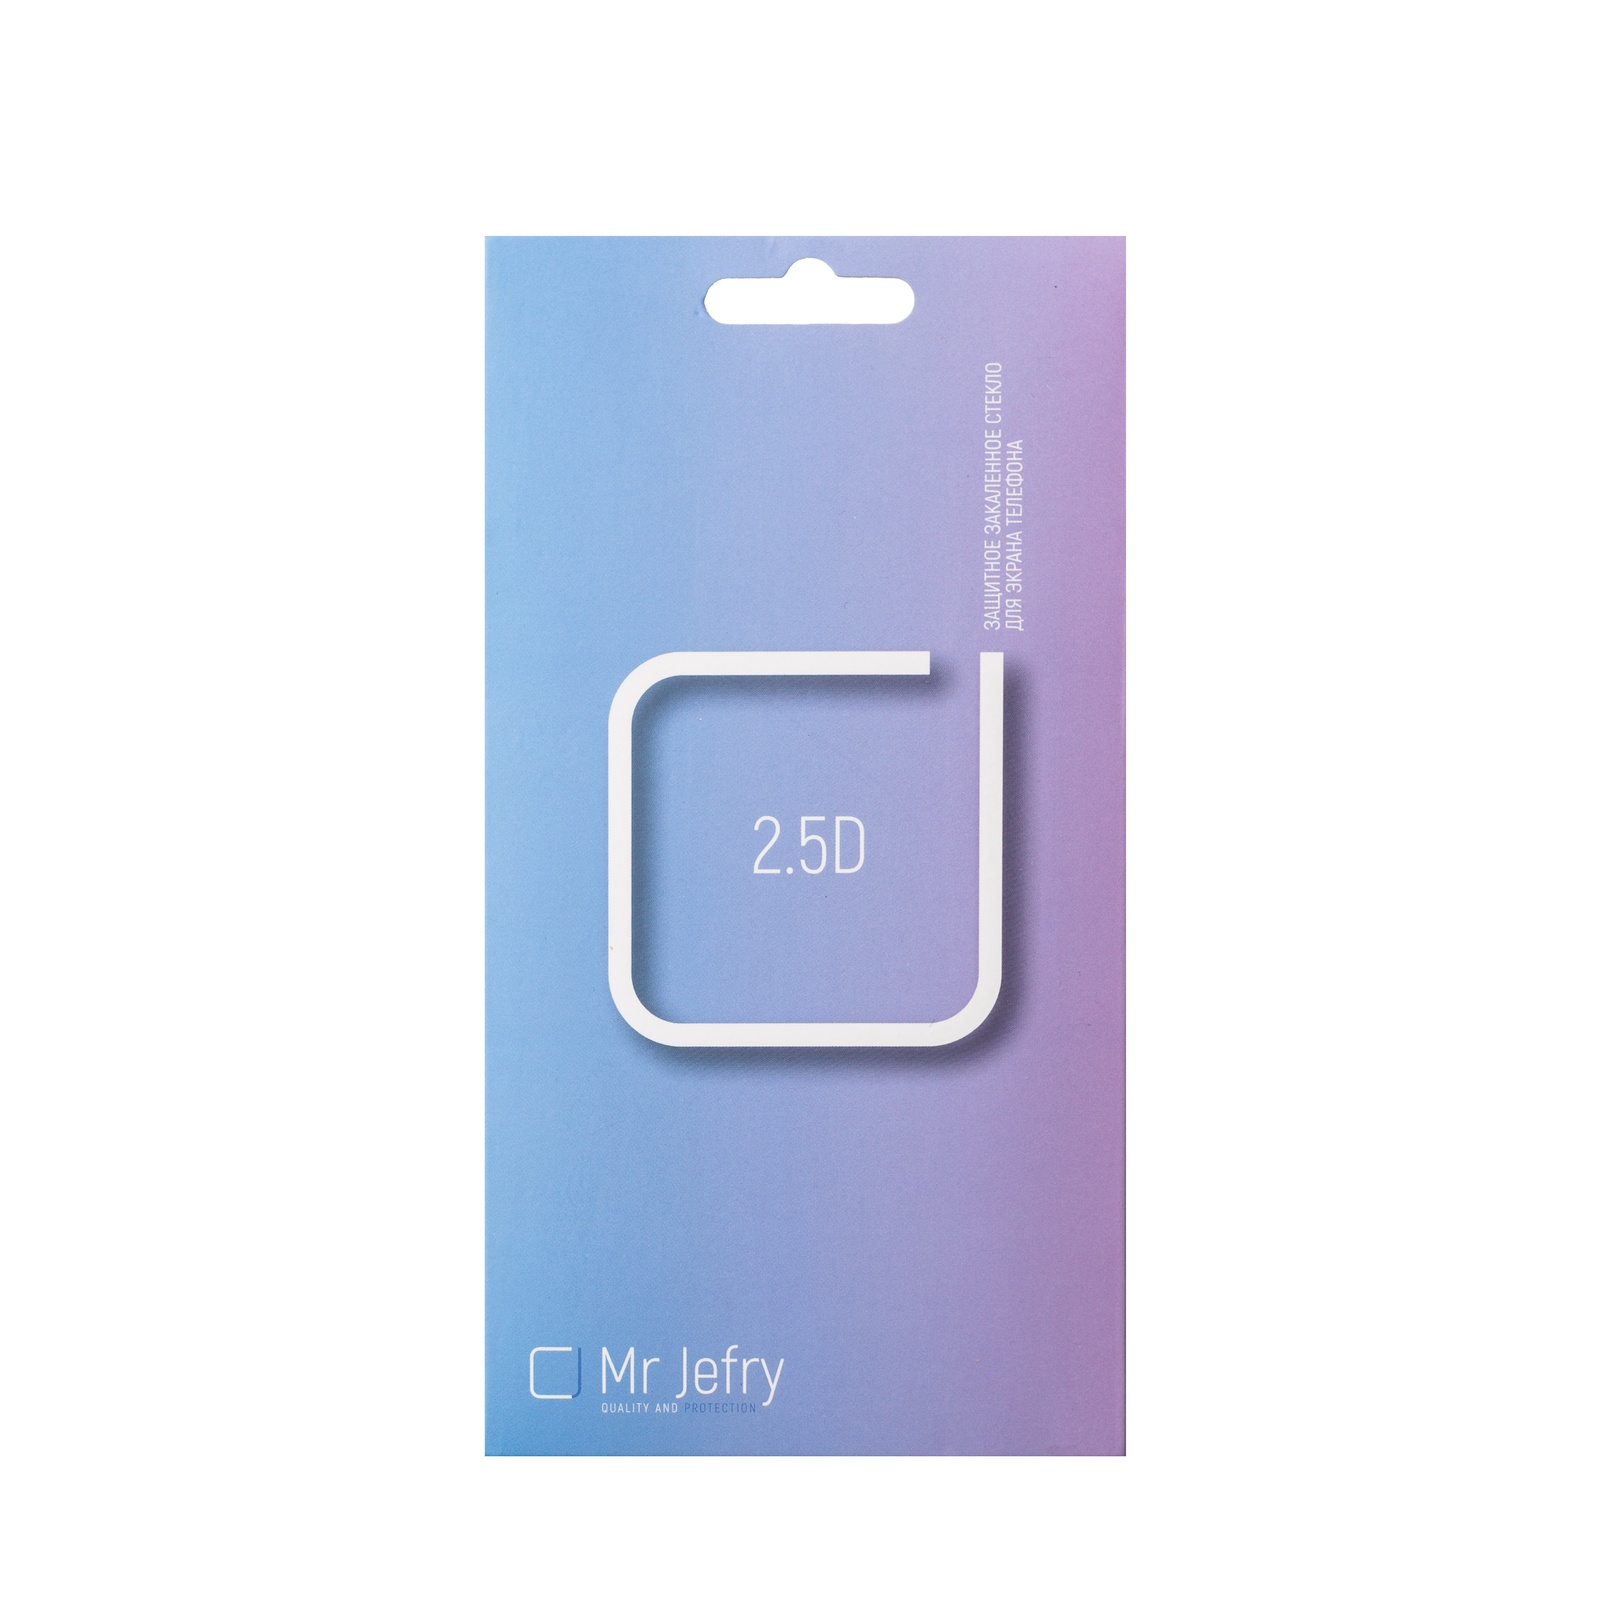 Mr Jefry стекло защитное (многослойное) 2,5D для Huawei Honor 7 A pro